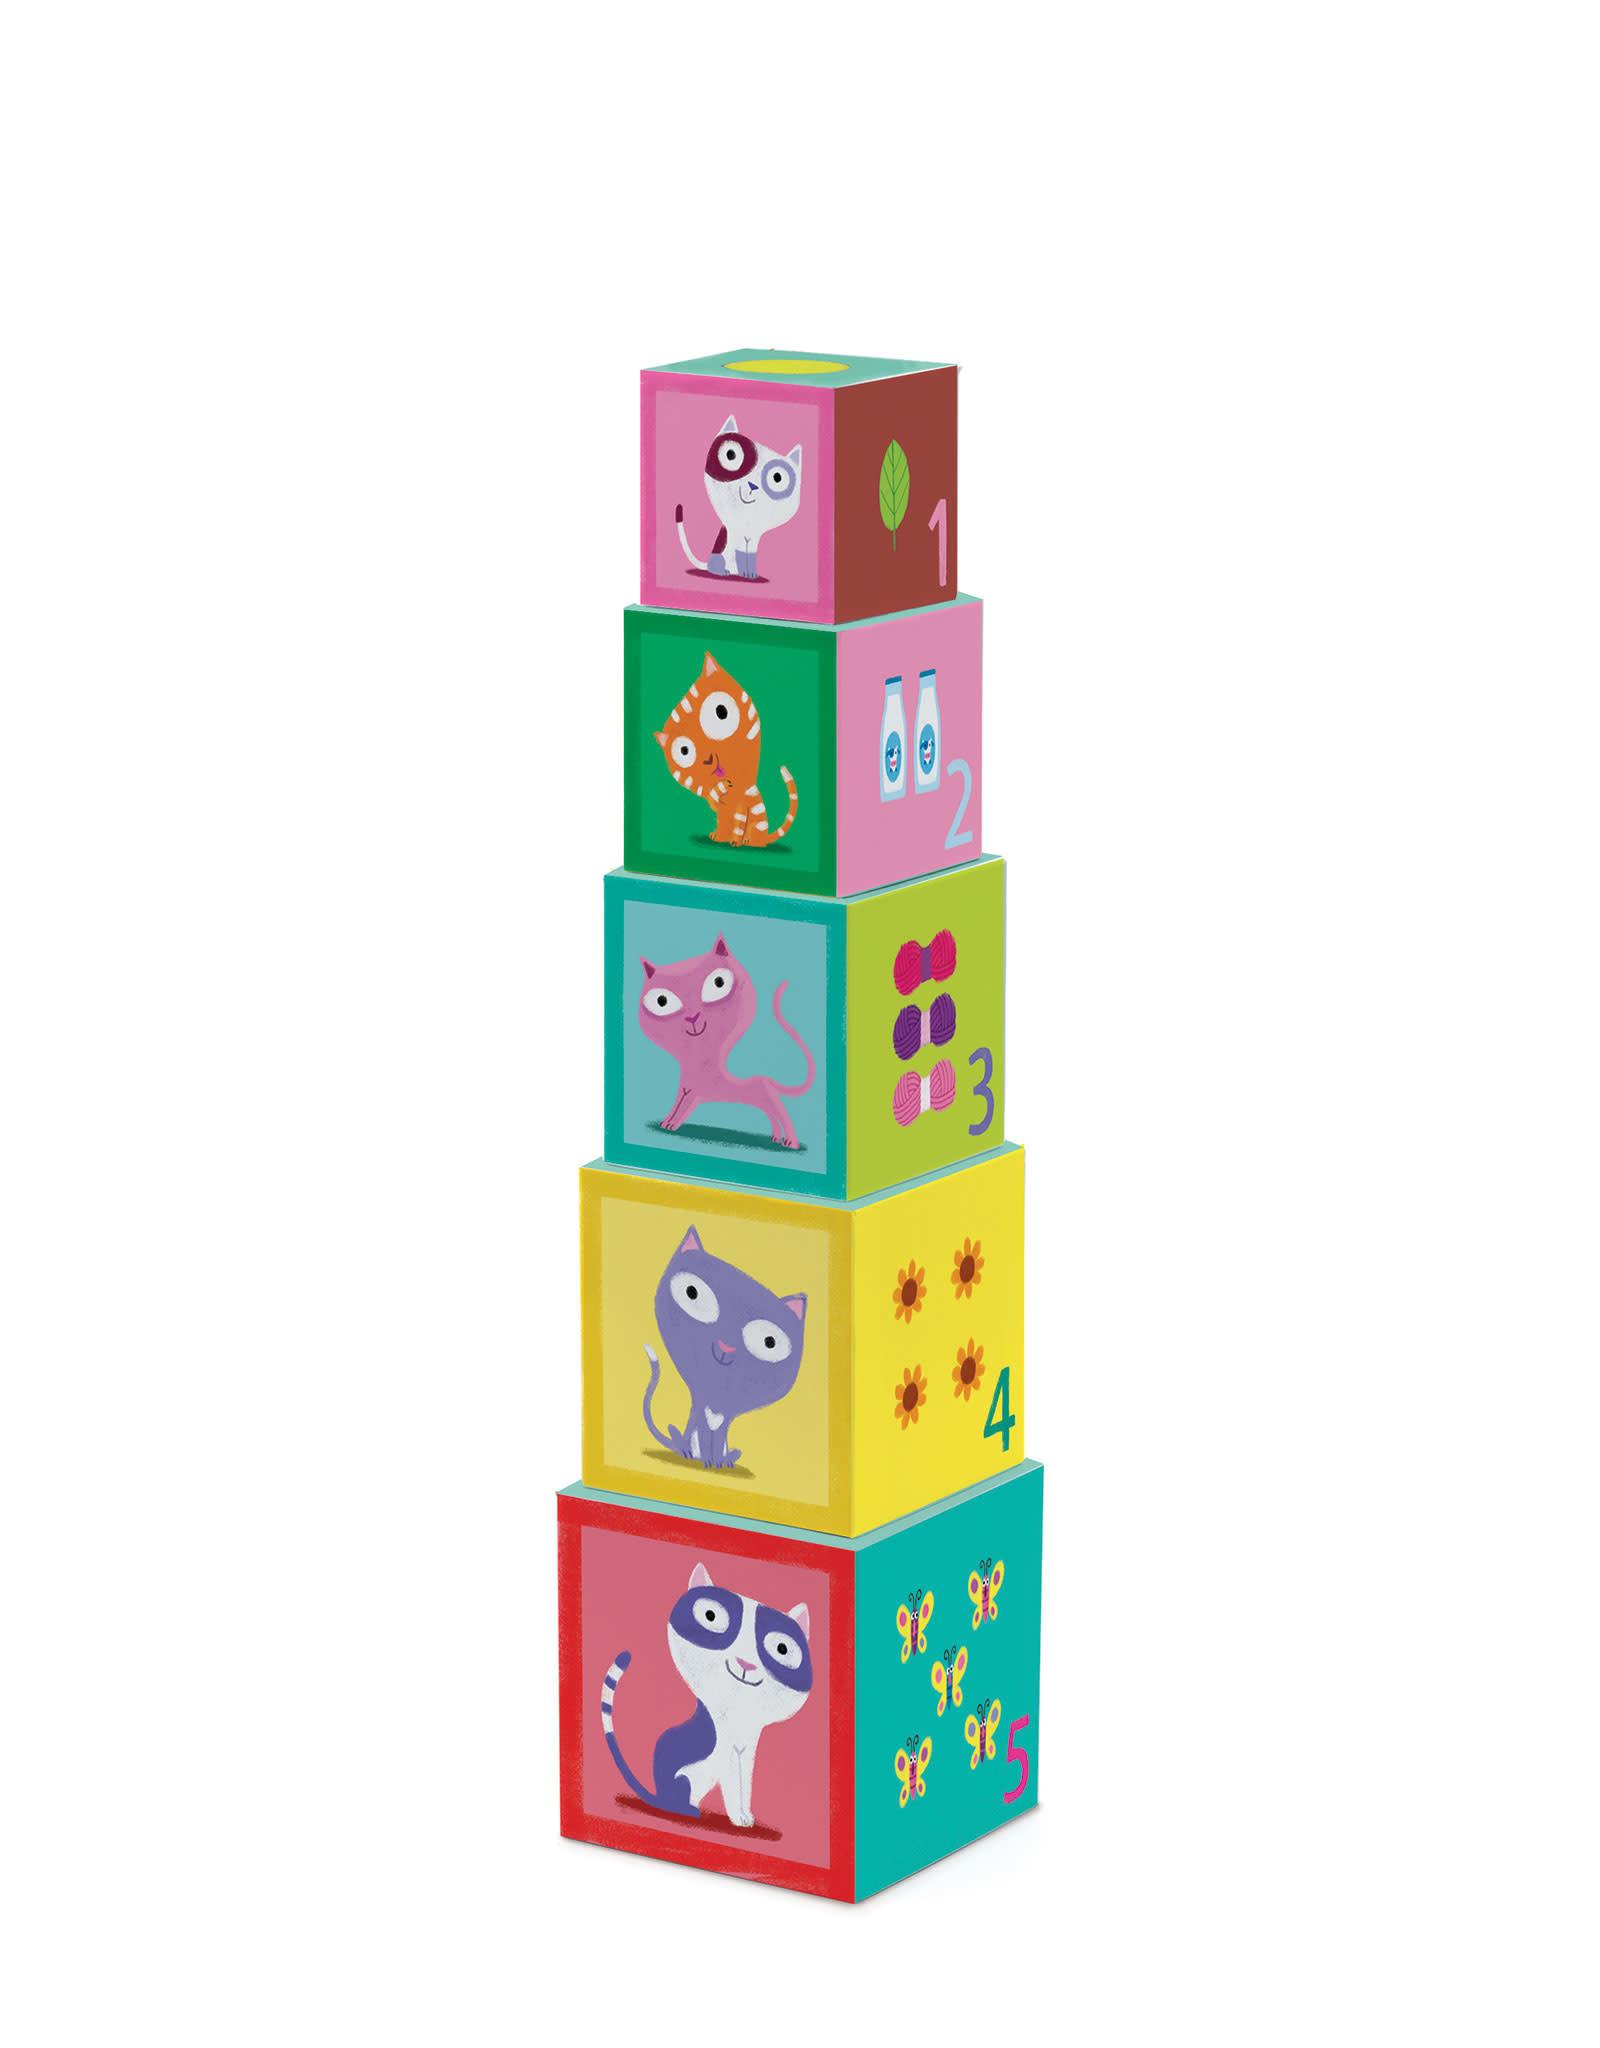 Djeco Stacking Blocks - Catibloc